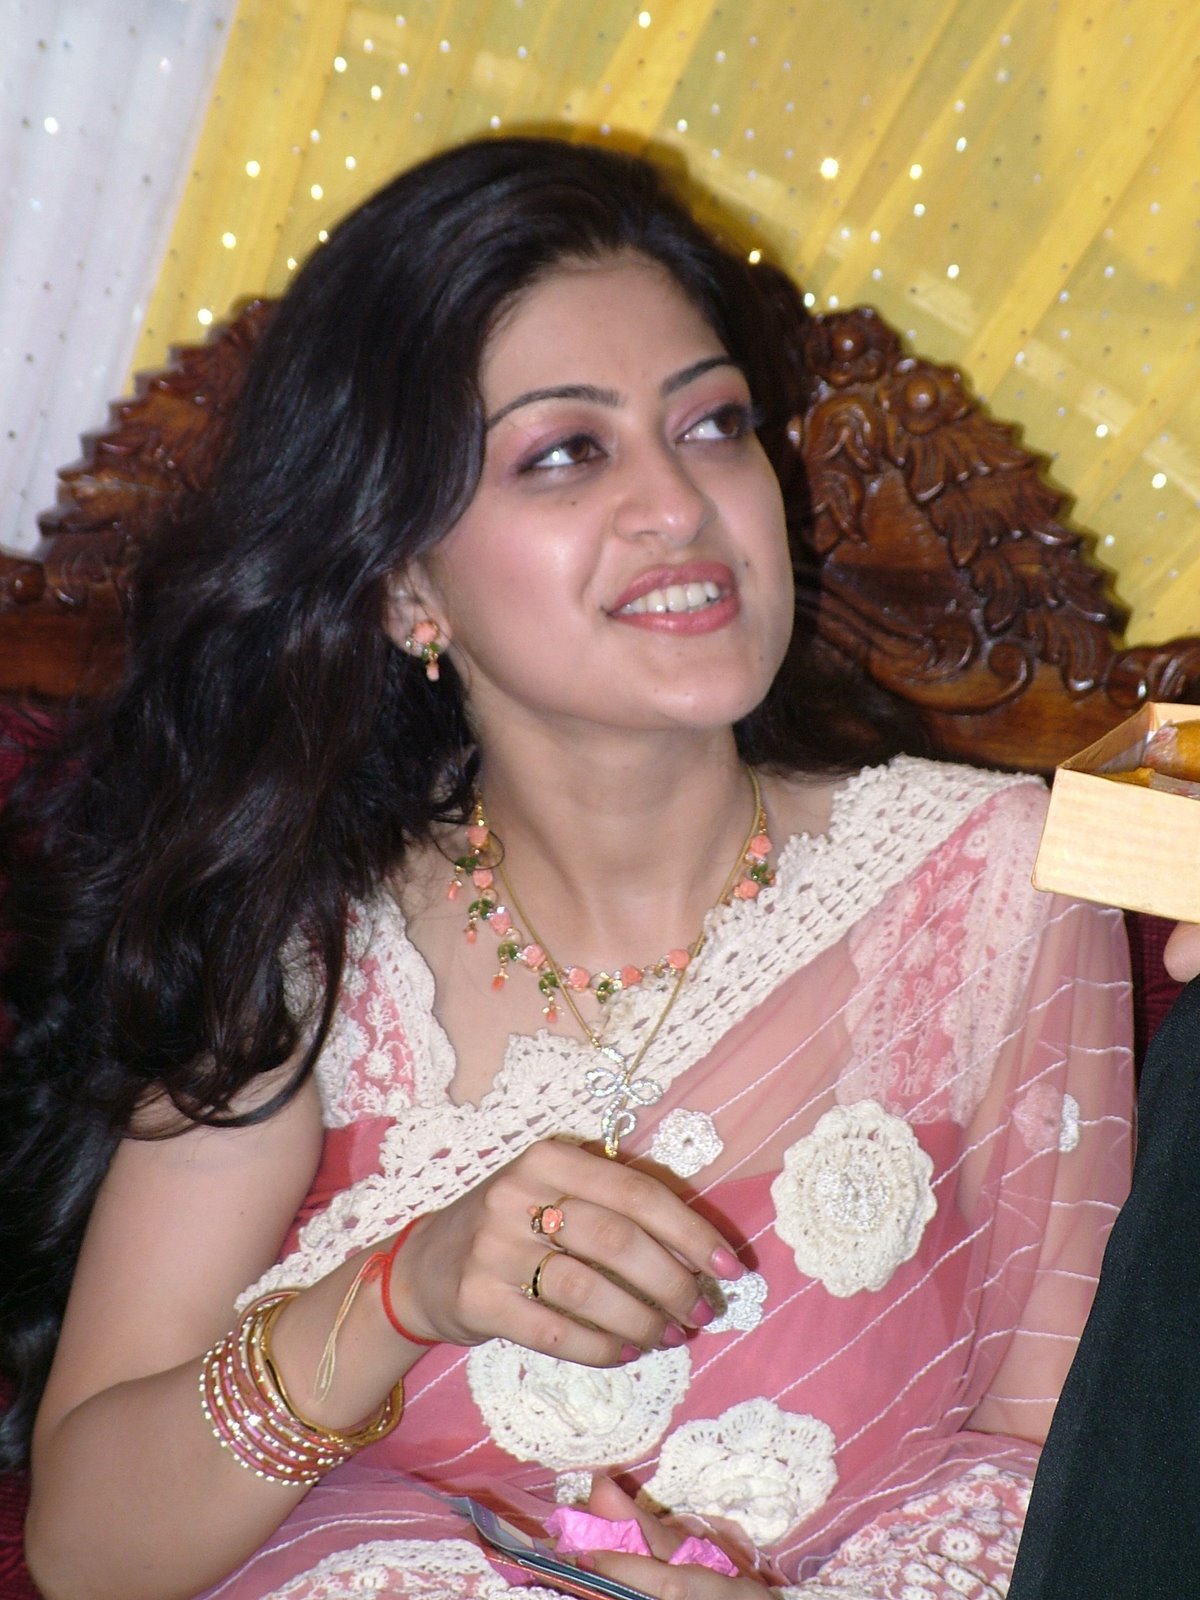 New Desi Photos Indore Shadi Hall Naina Bhabhi